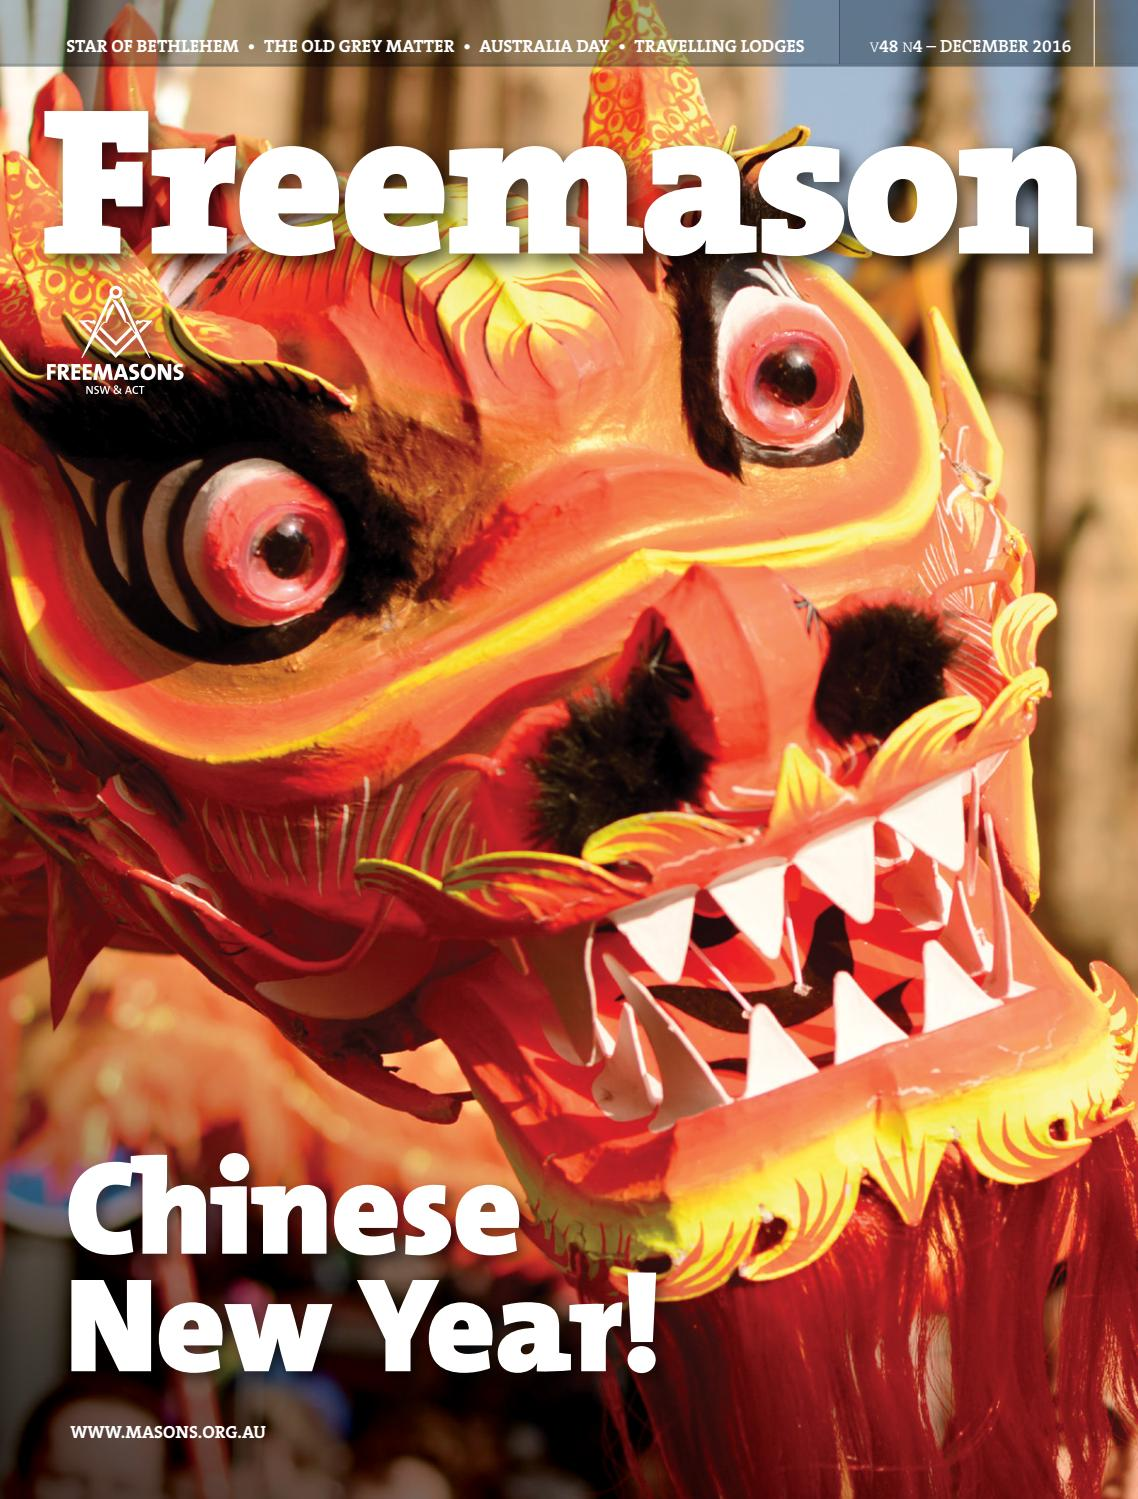 Freemason nsw act december 2016 by apm graphics management issuu m4hsunfo